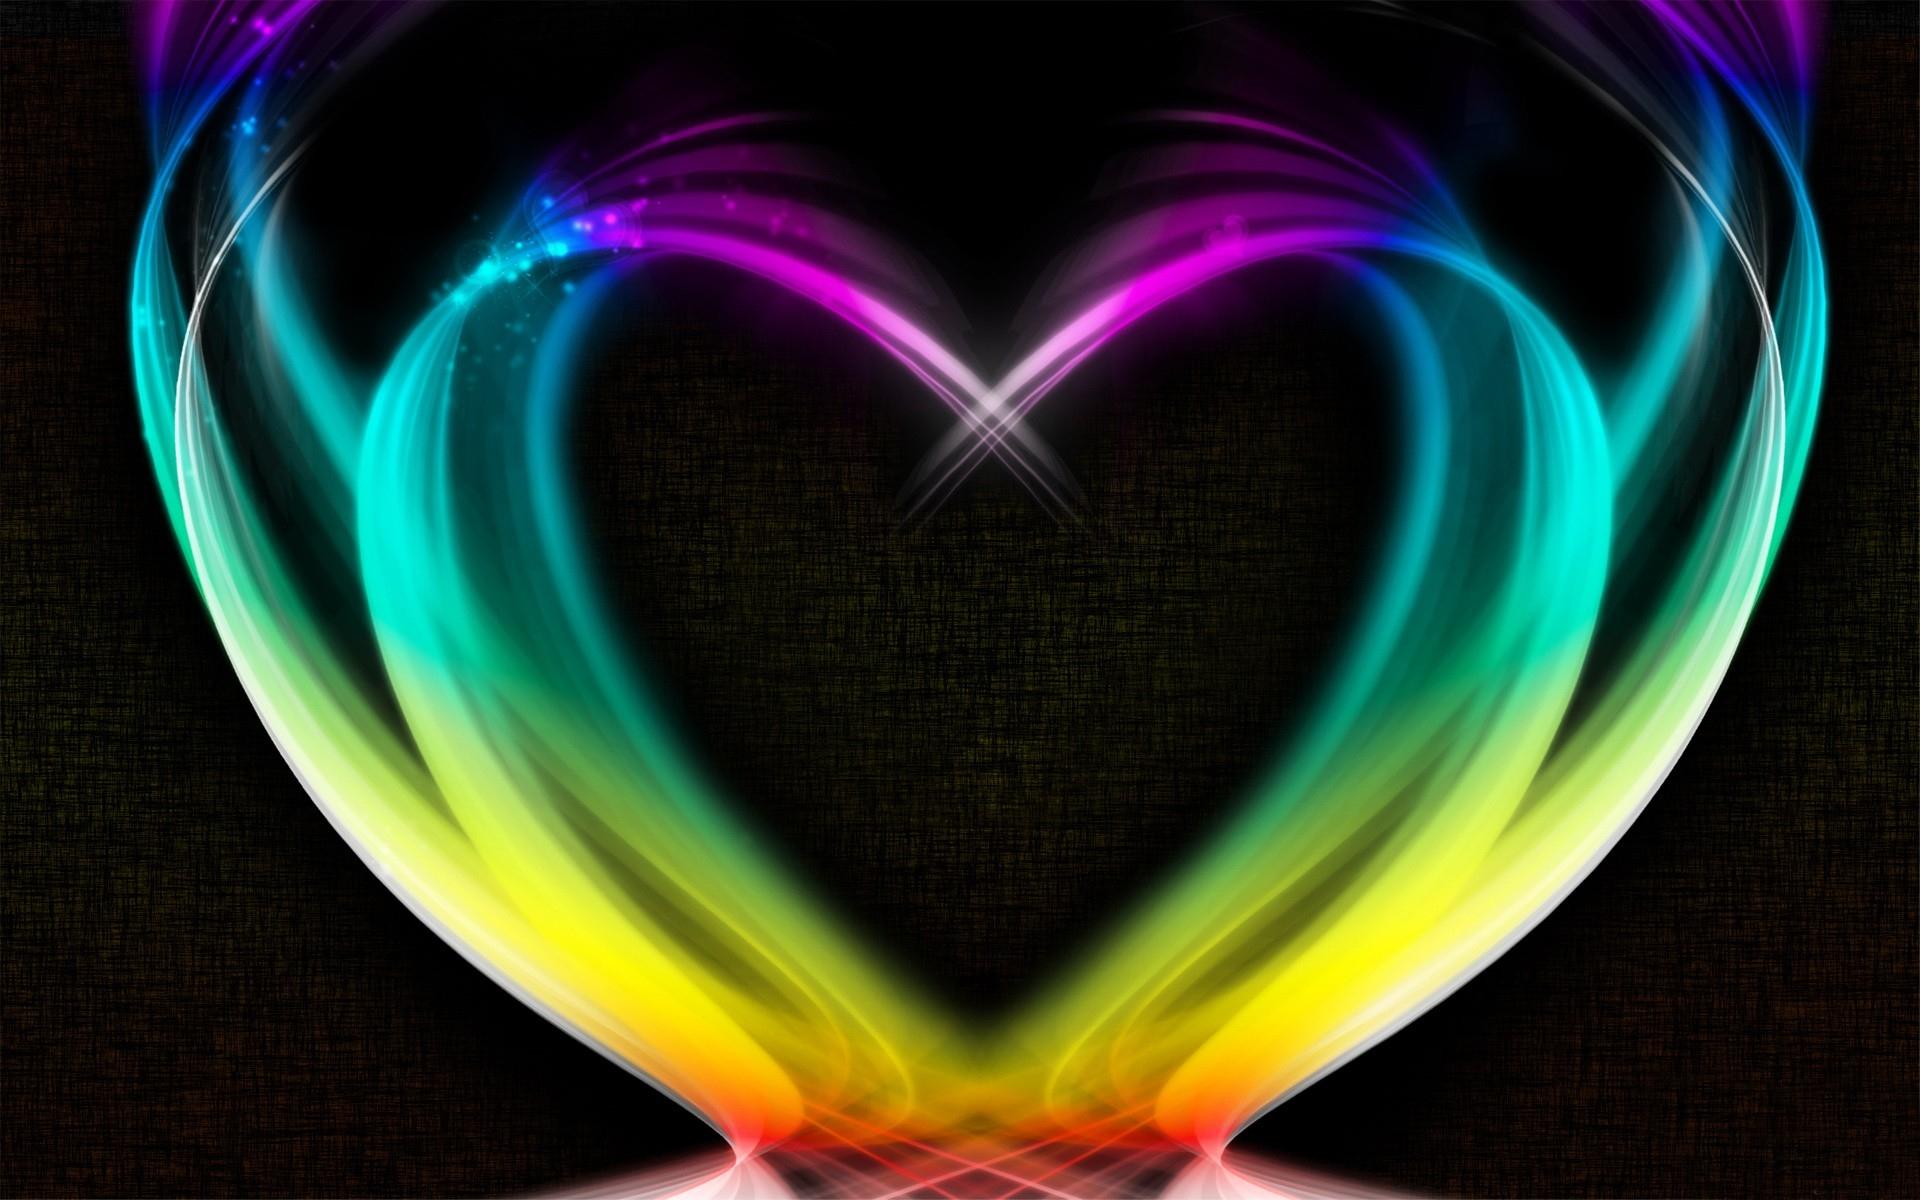 Heart Rainbow Smoke Colorful